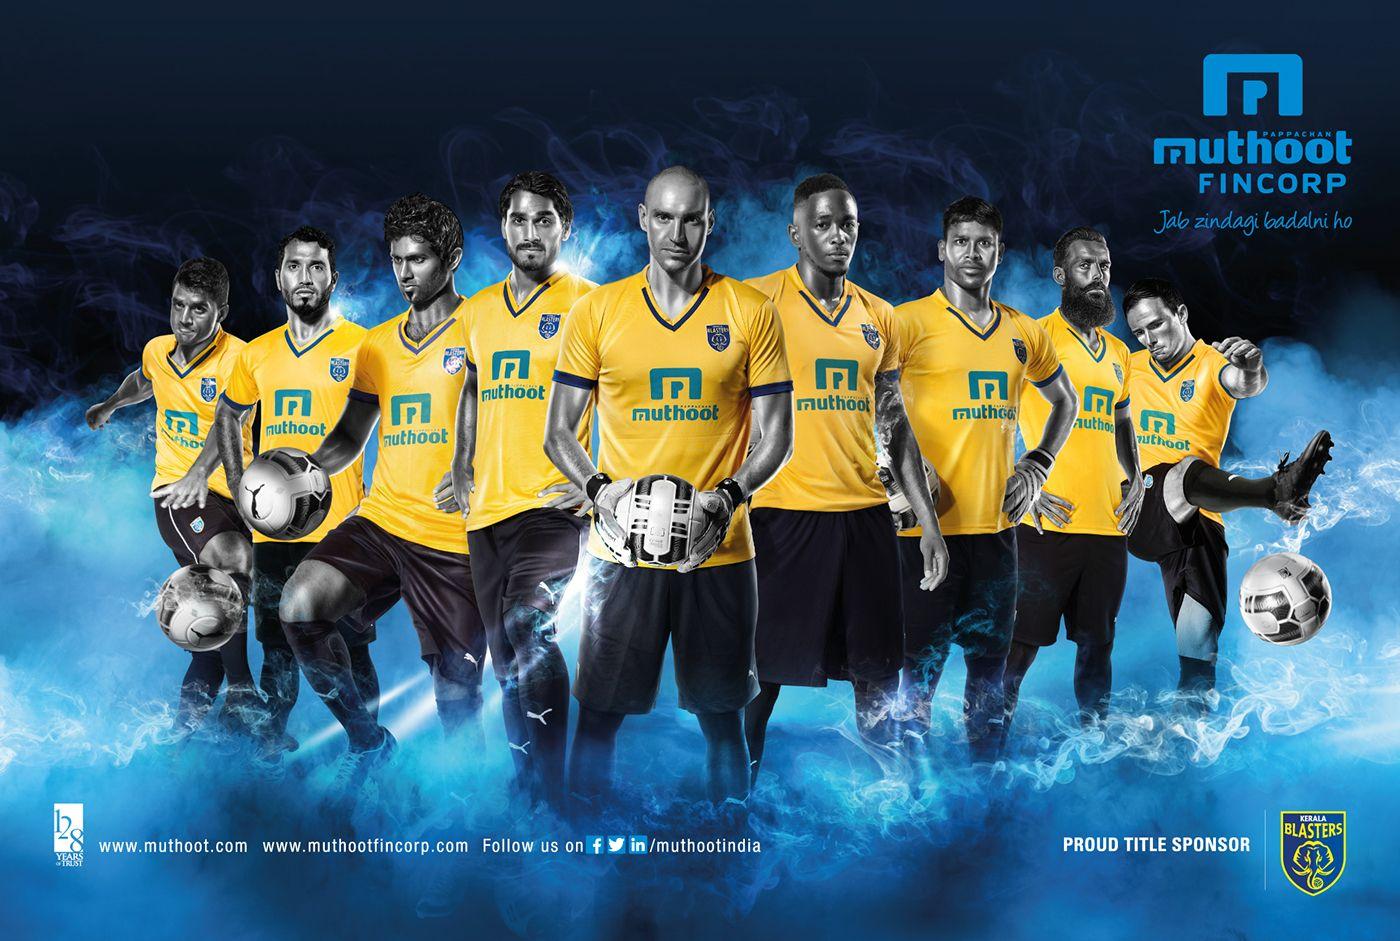 Muthoot kerala Blasters Indian Super League On Behance   Muthoot 1400x941